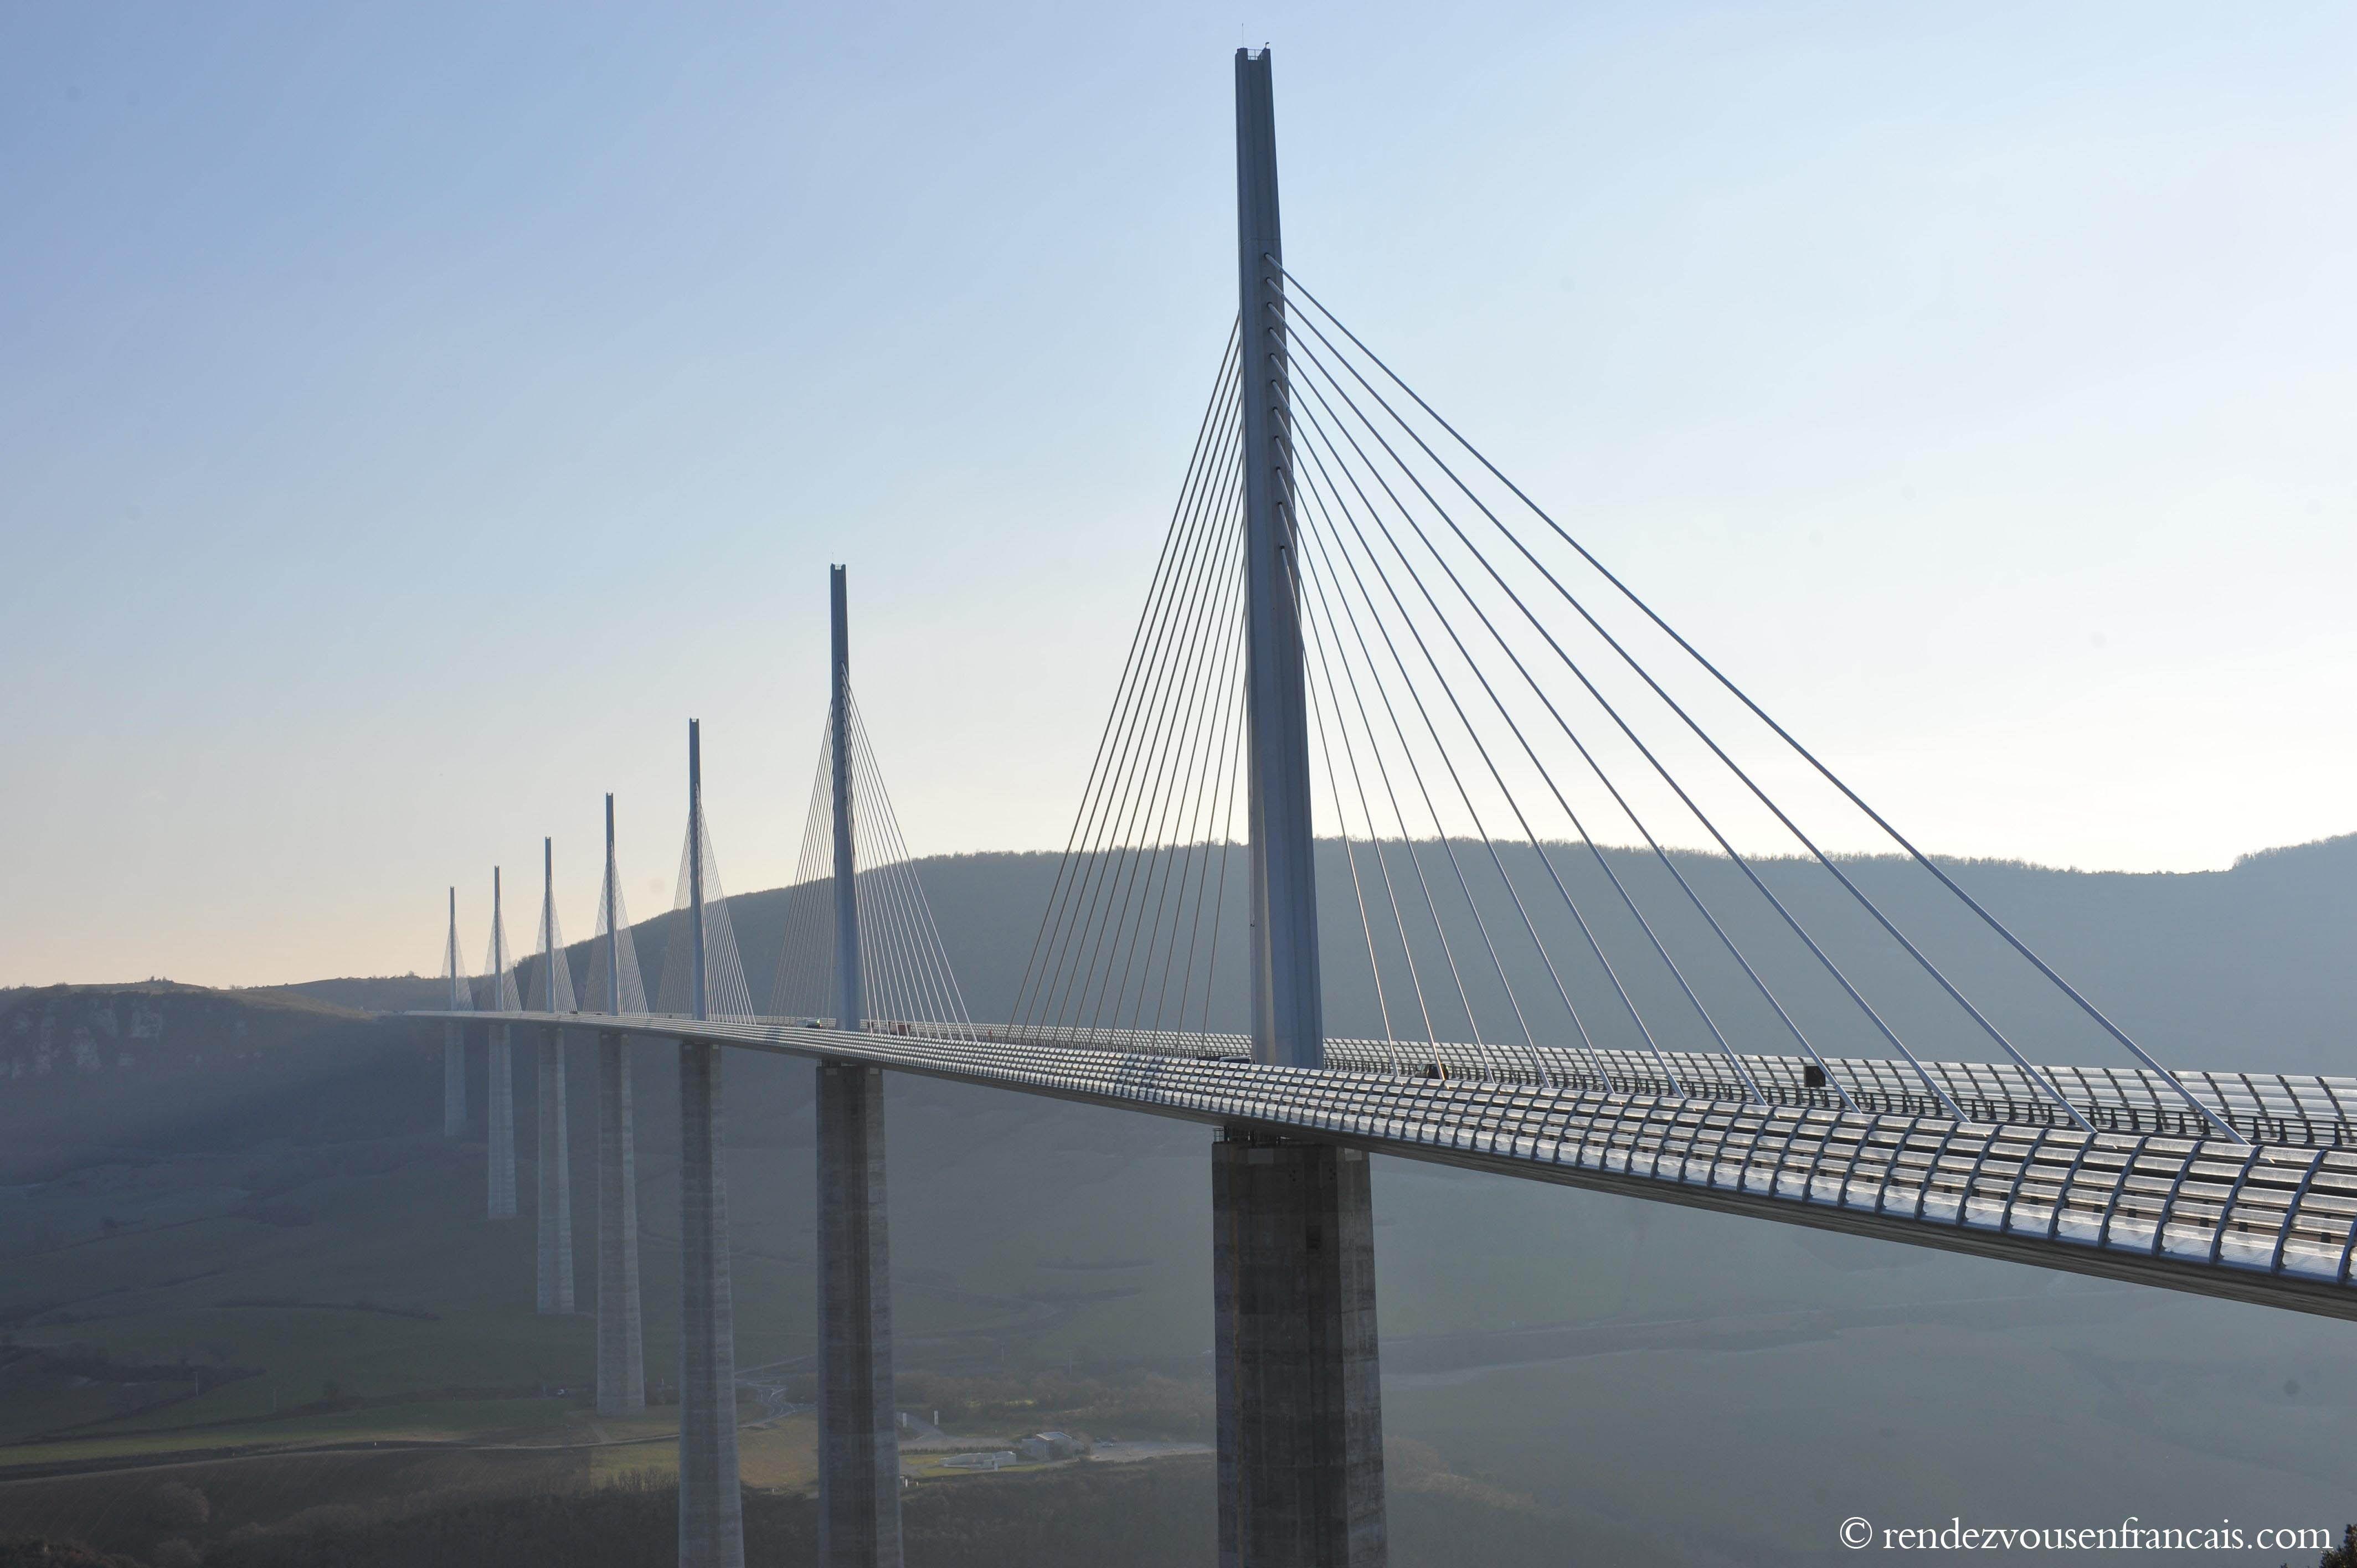 Millau Viaduc Highest Bridge In The World